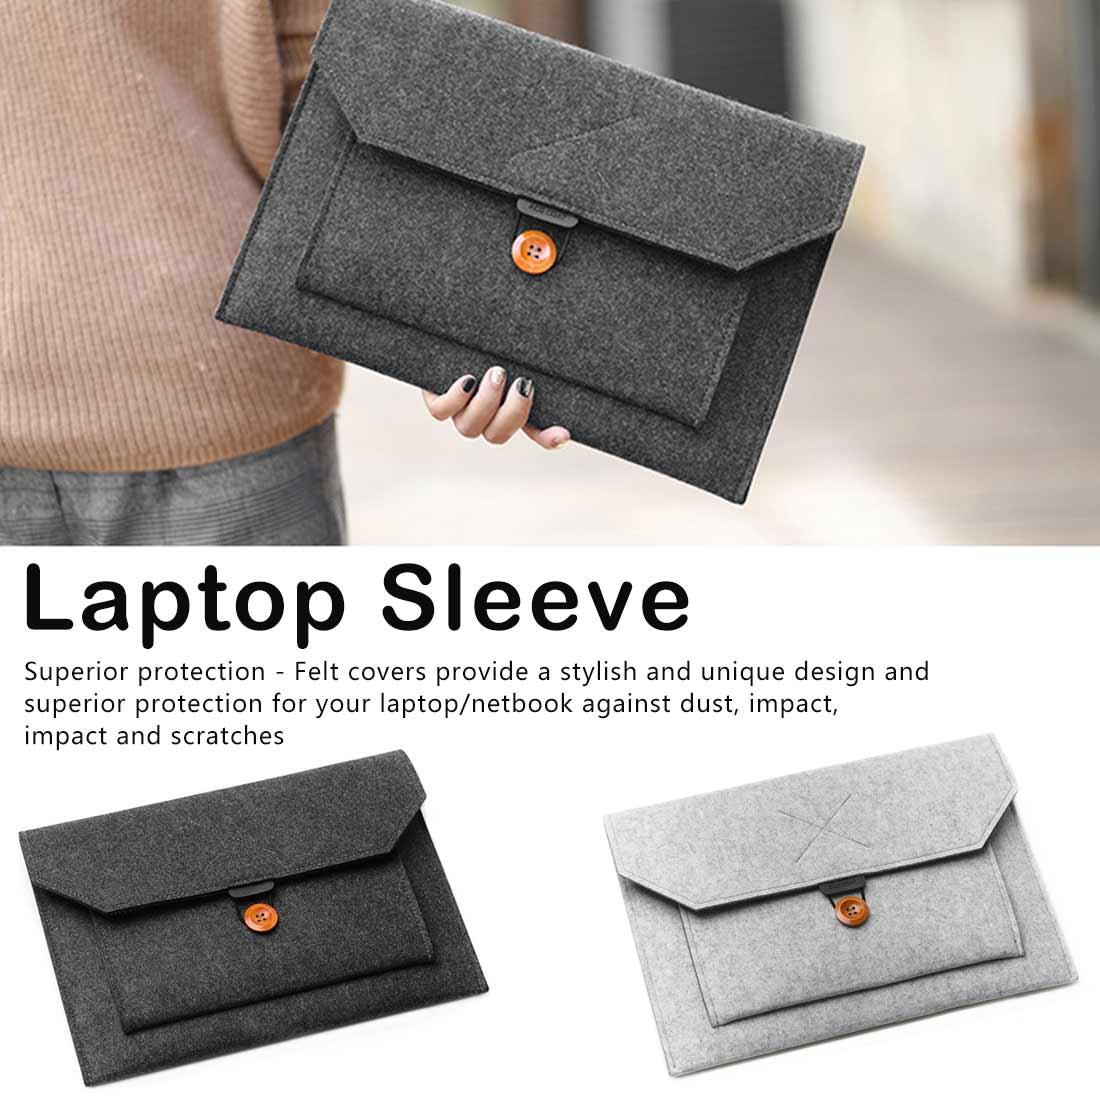 Fashion Wool Felt Handbag Case Laptop Sleeve Bag Laptop For Macbook Air Pro 12 13.3 14 Lenovo Asus HP Laptop Liner Bag